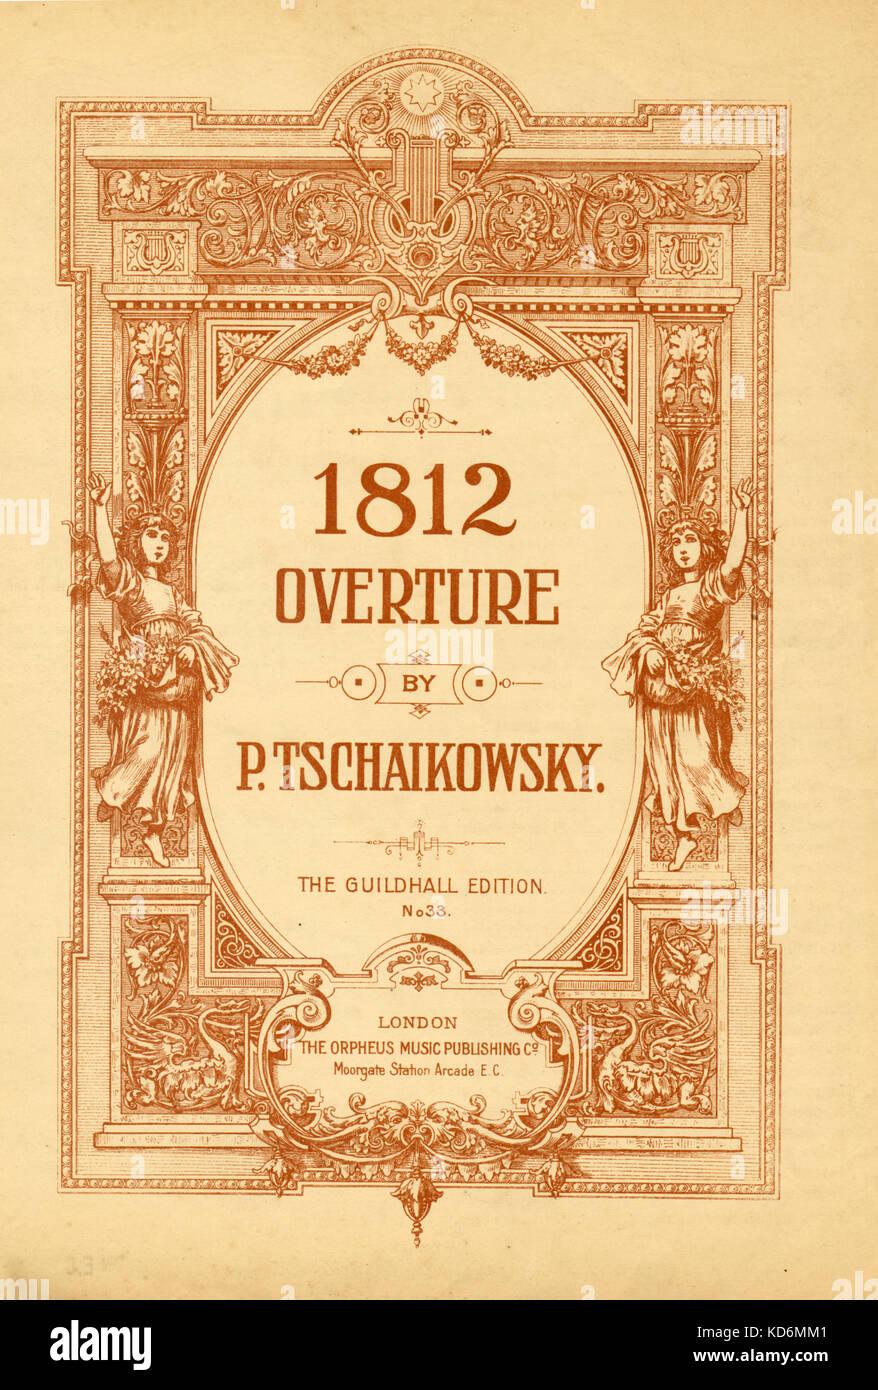 Tchaikovsky, Piotr I  1812 Overture Opus 49- title page